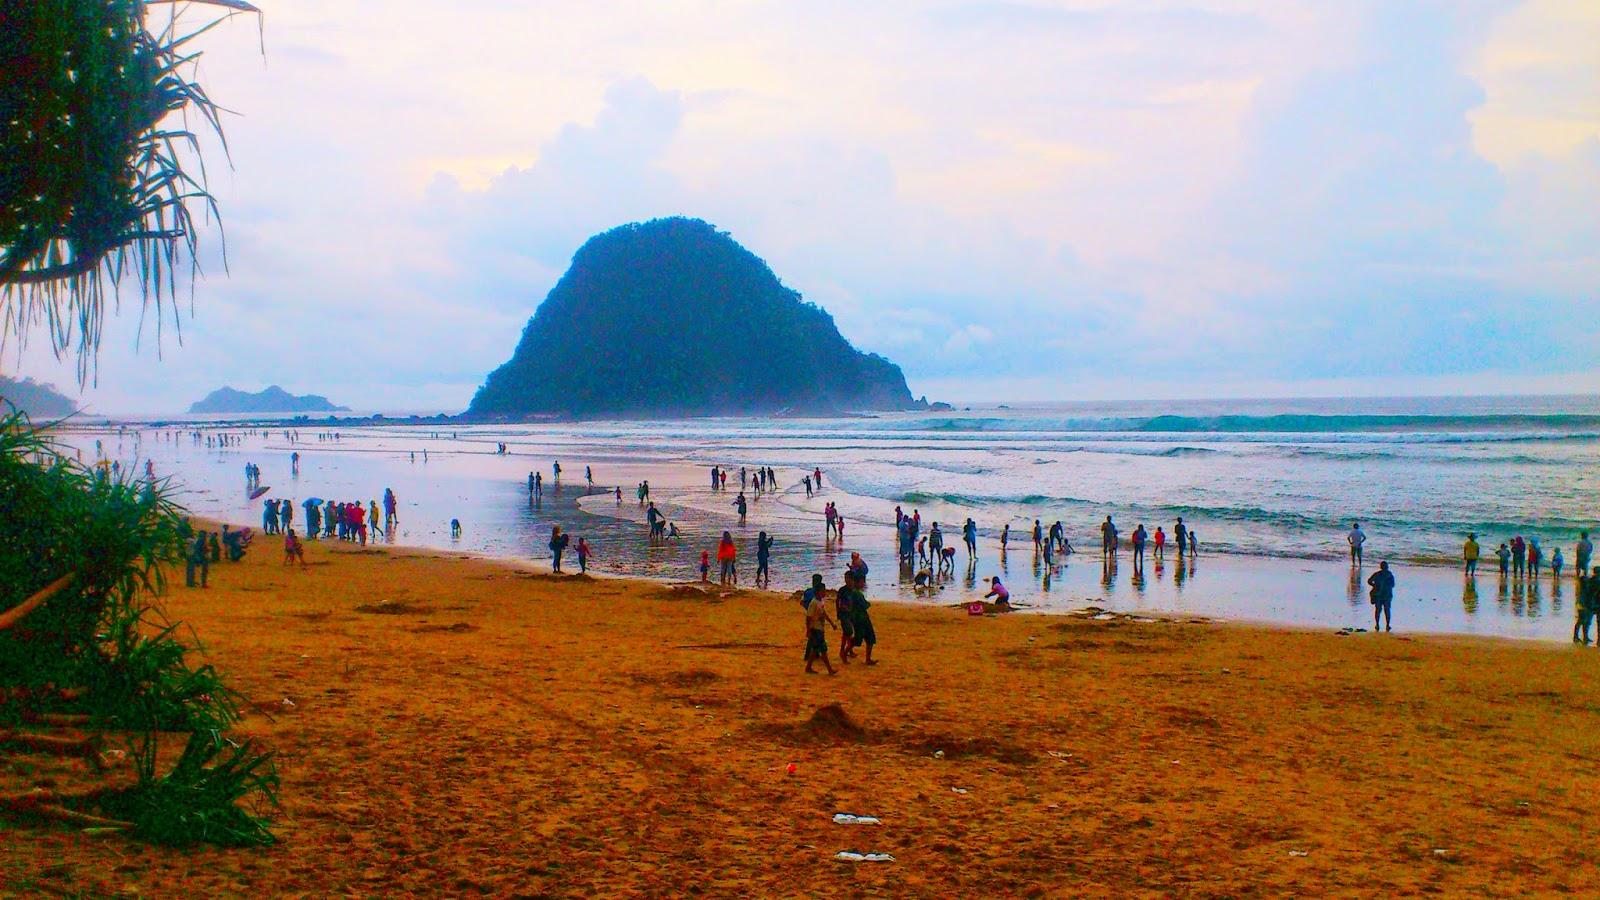 Pesona Pantai Wisata Pulau Merah Banyuwangi Jawatimur Ndi Red Island